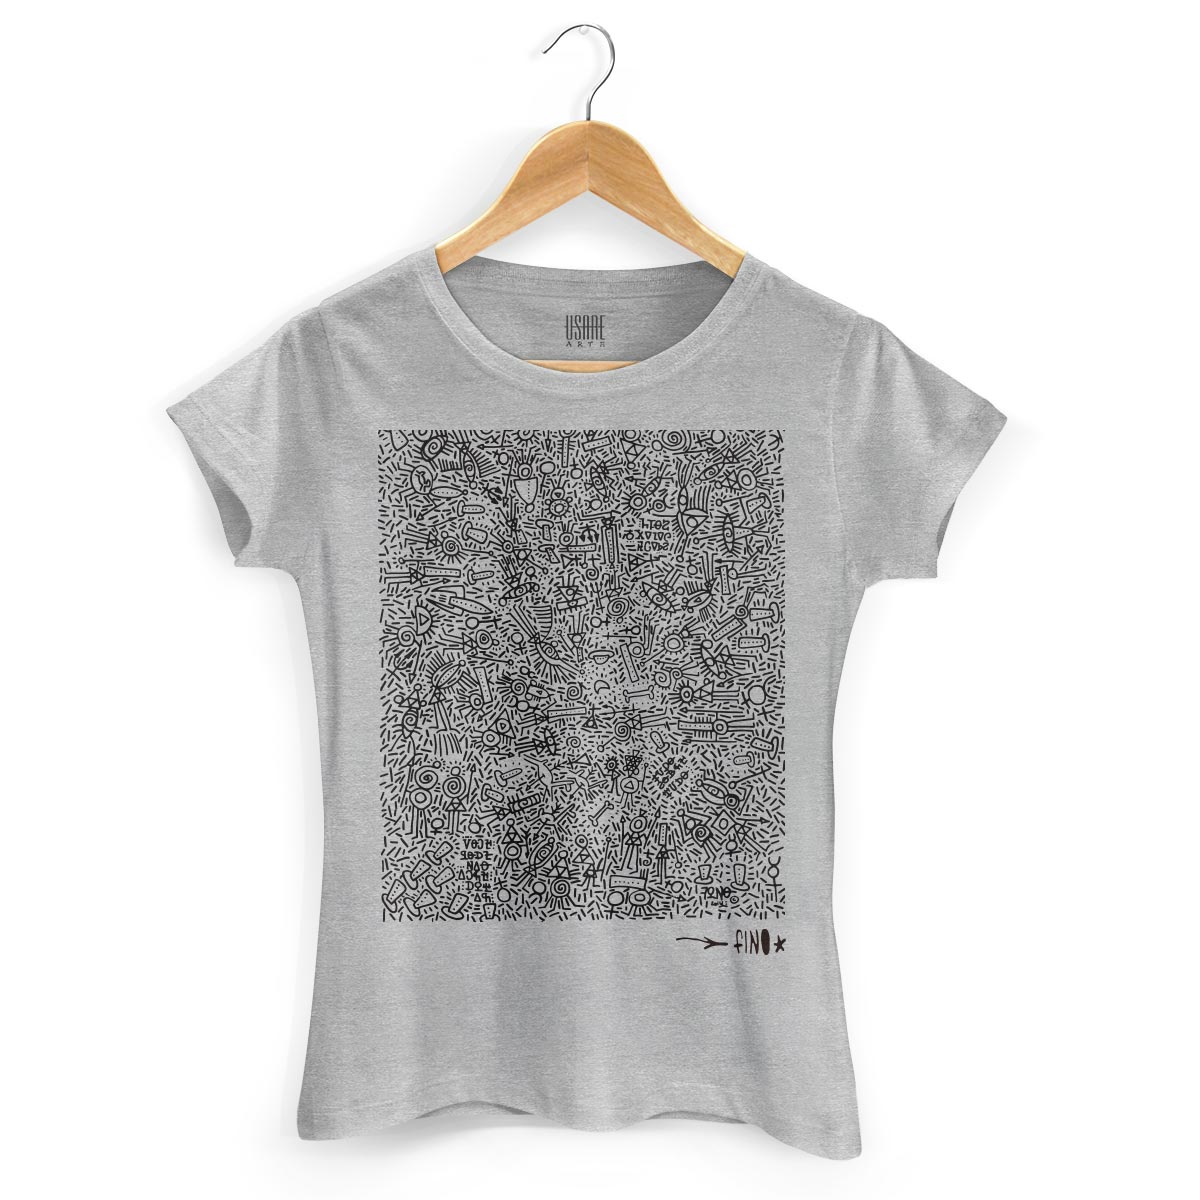 Camiseta Feminina Fino Farofa de Religião Gray